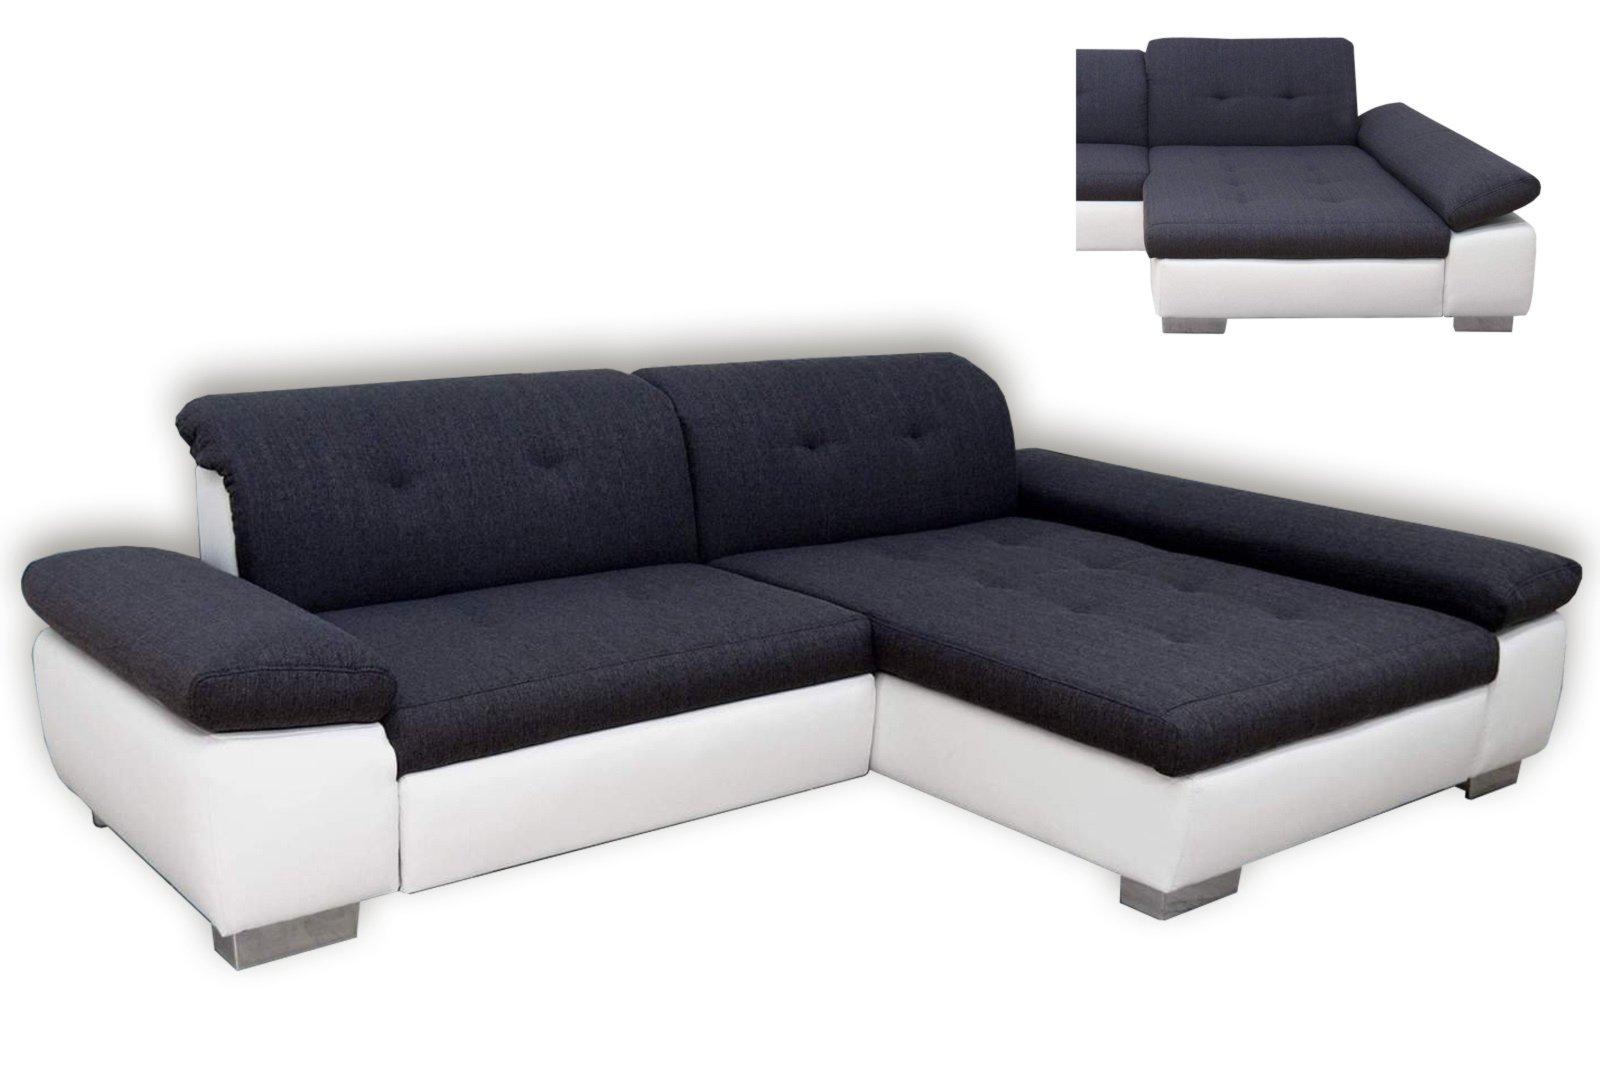 polsterecke anthrazit wei mit funktionen recamiere rechts ecksofas l form sofas. Black Bedroom Furniture Sets. Home Design Ideas